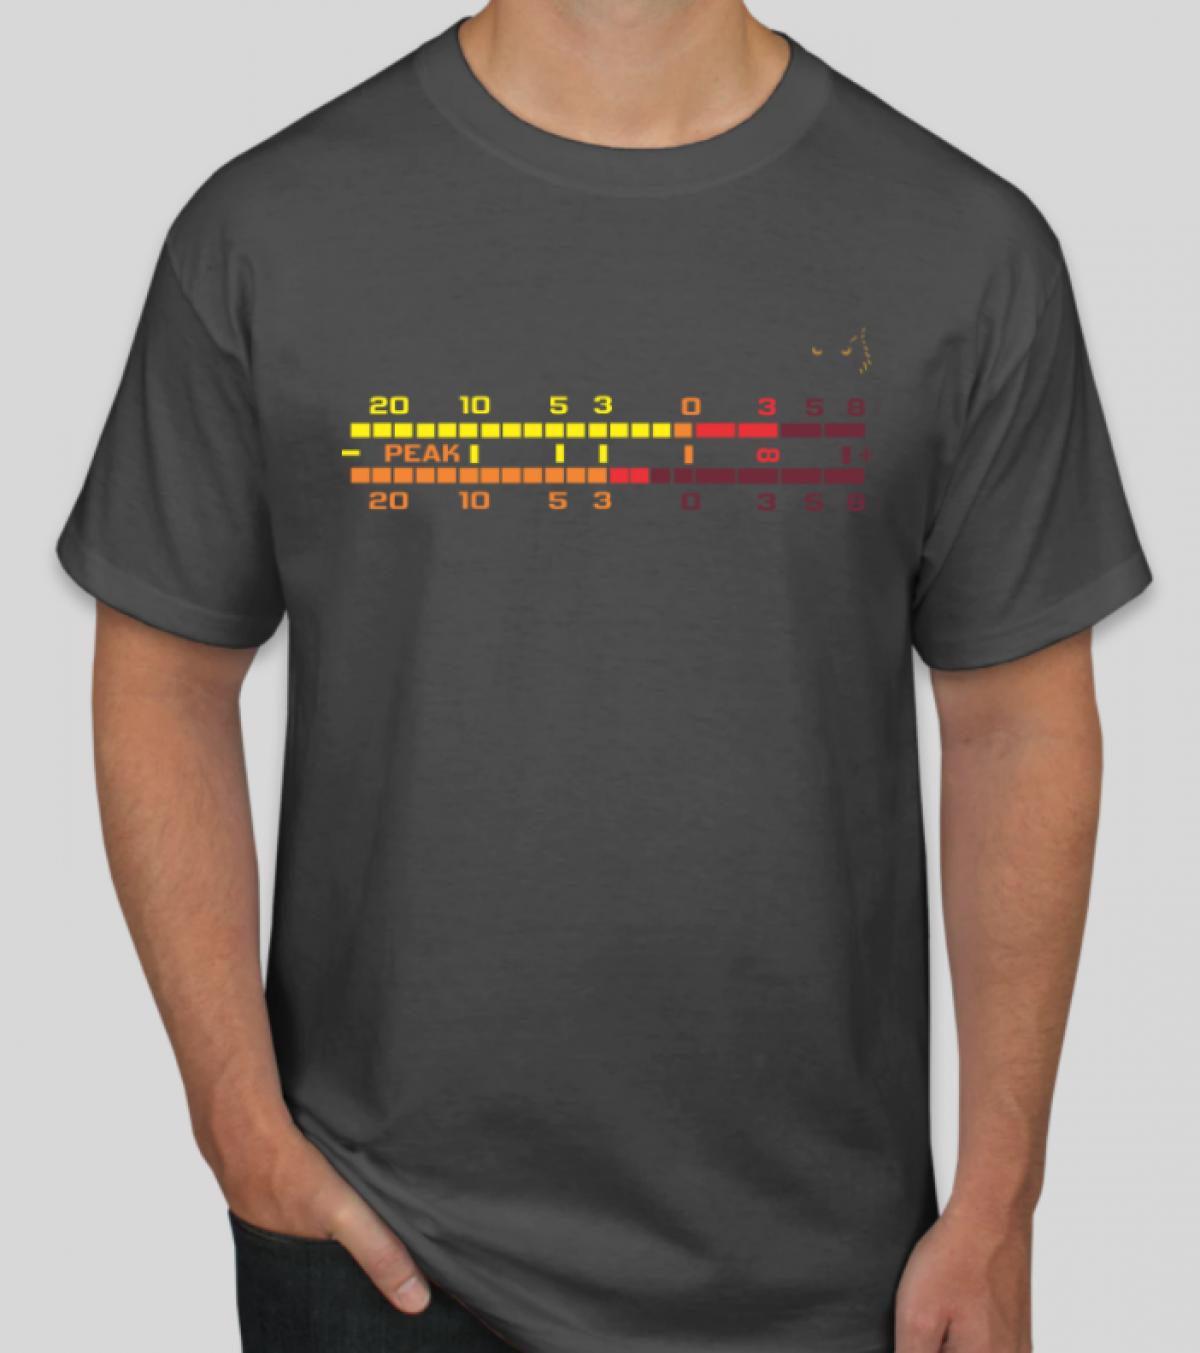 Camiseta VU Digital Meter by B&C Custom - @bordado.cia